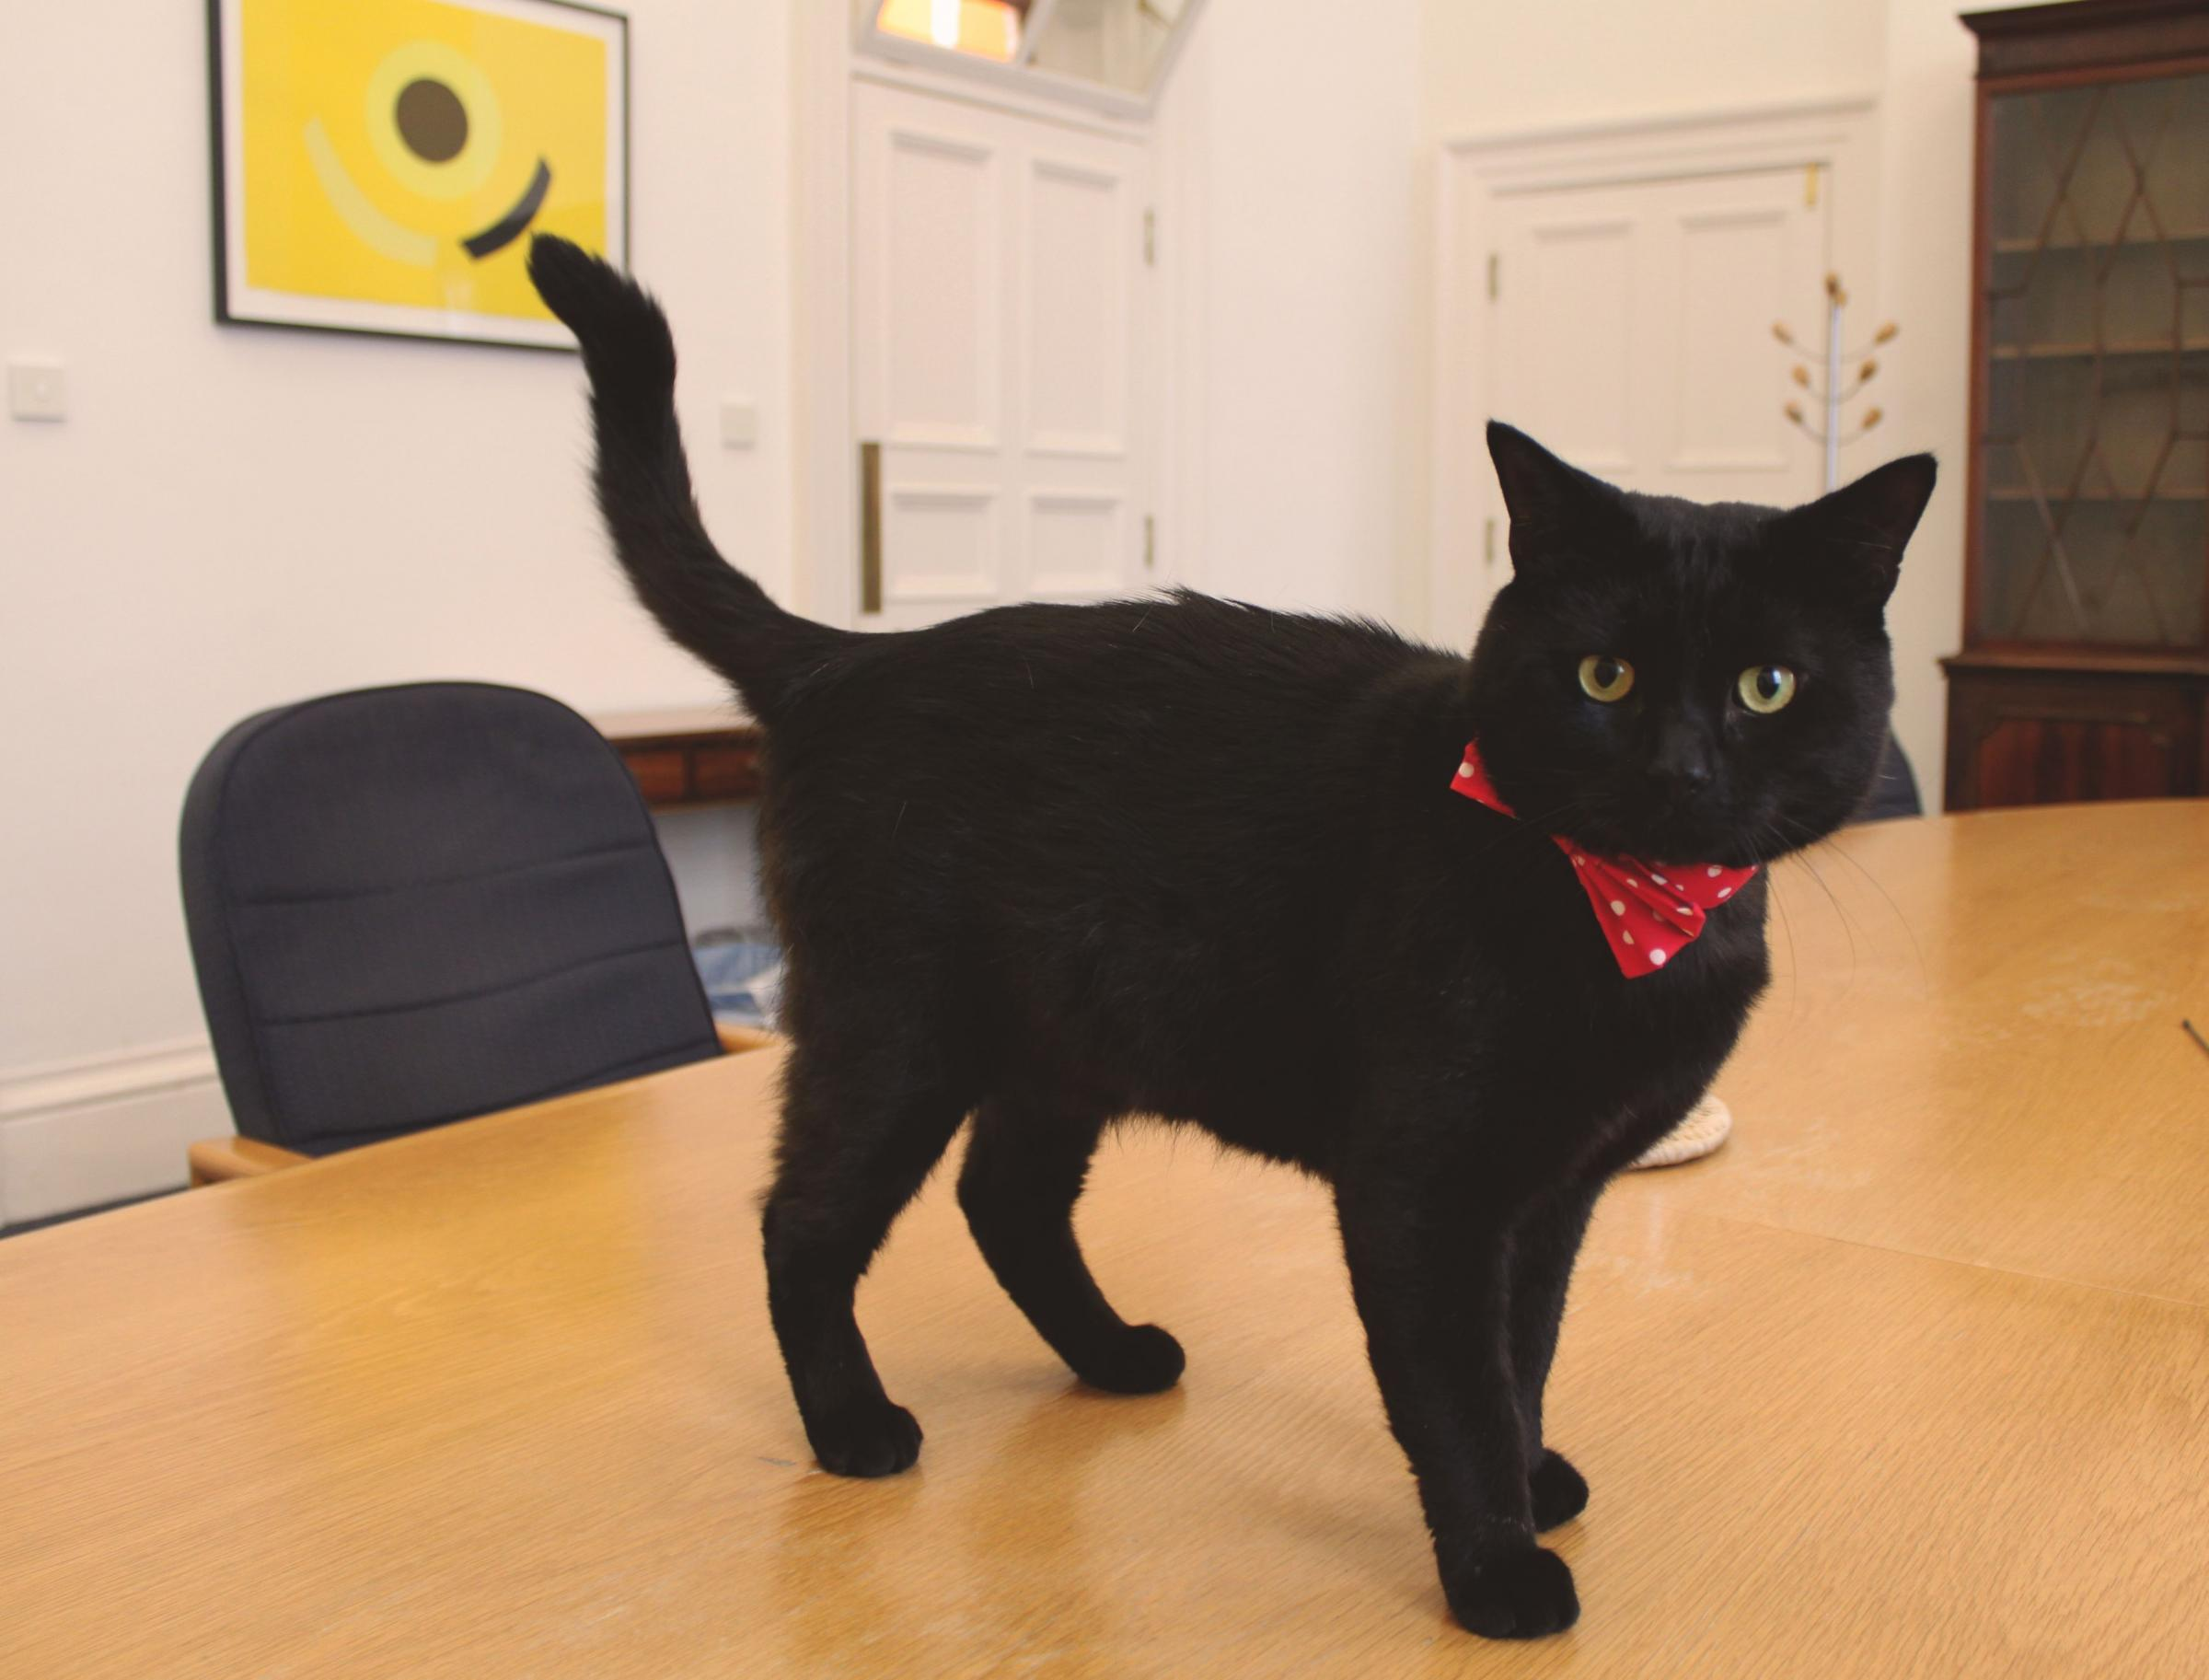 New cat Gladstone joins Whitehall feline elite at Treasury ...